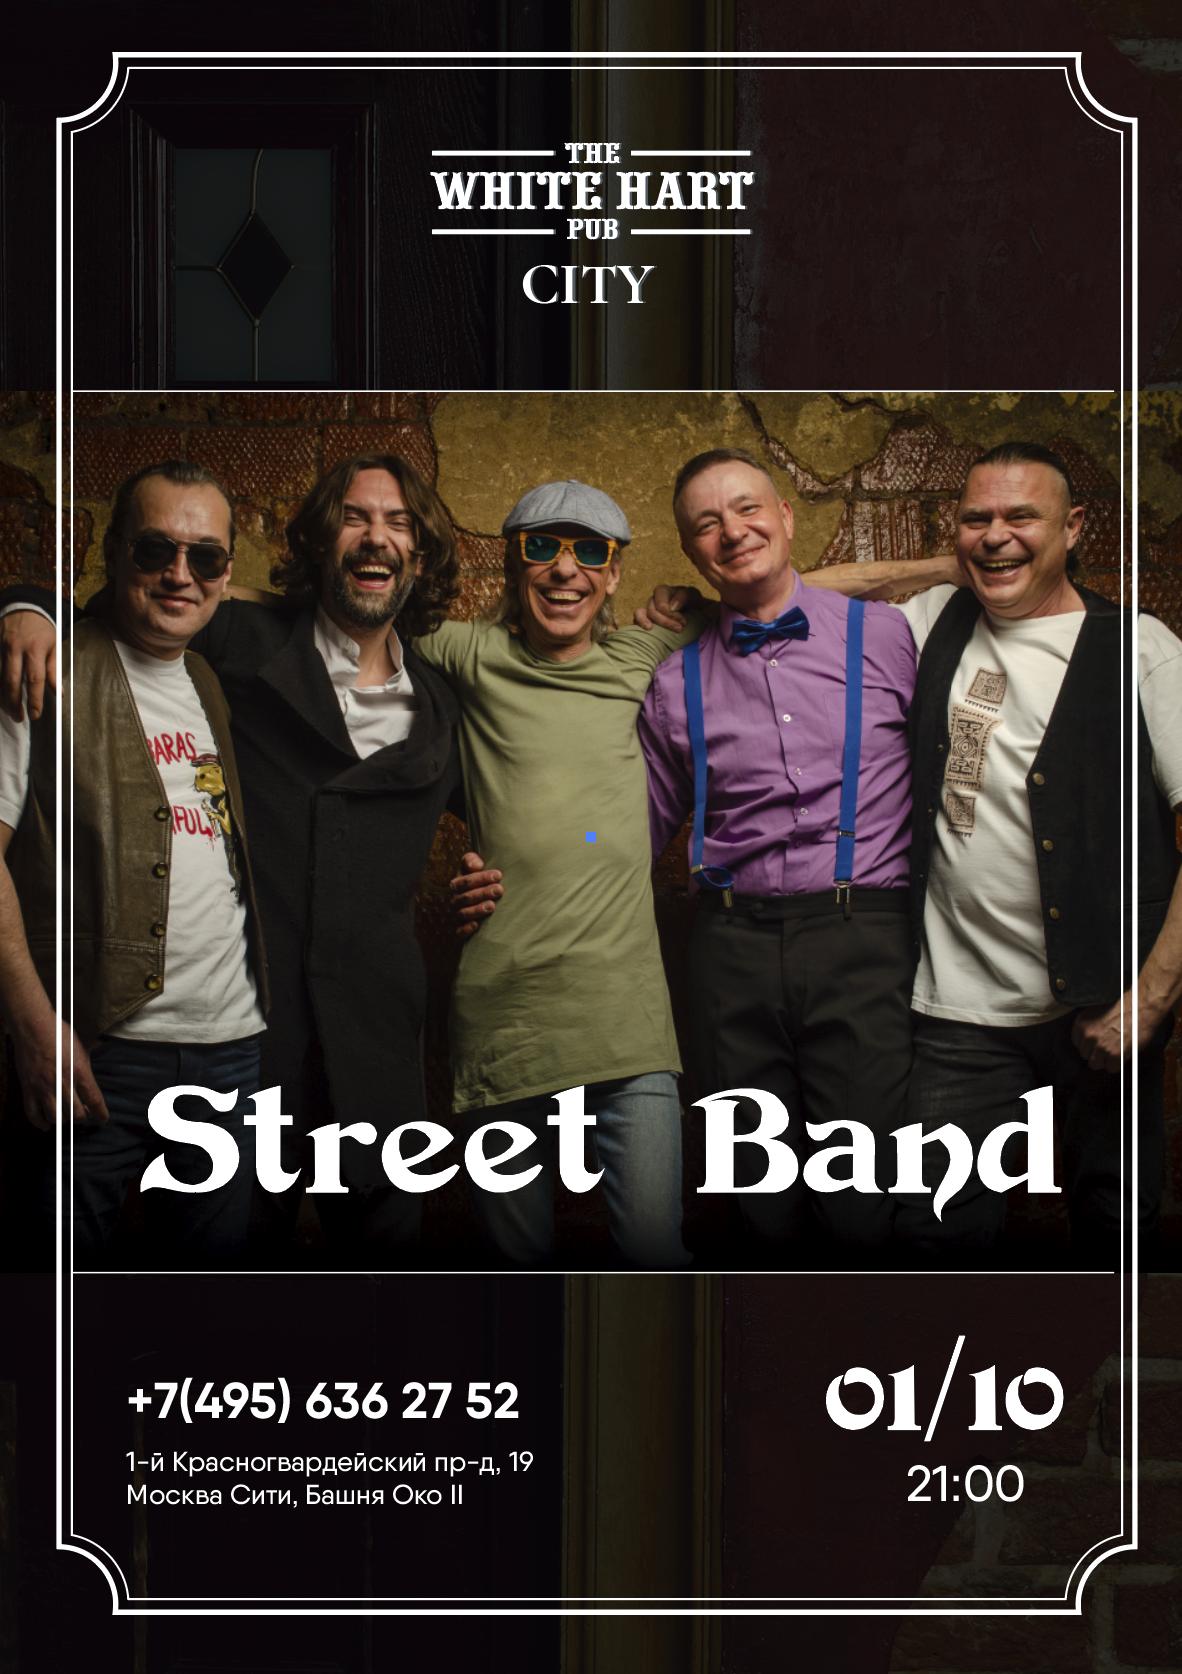 Афиша! 01 октября — Street Band в White Hart Pub Moscow City